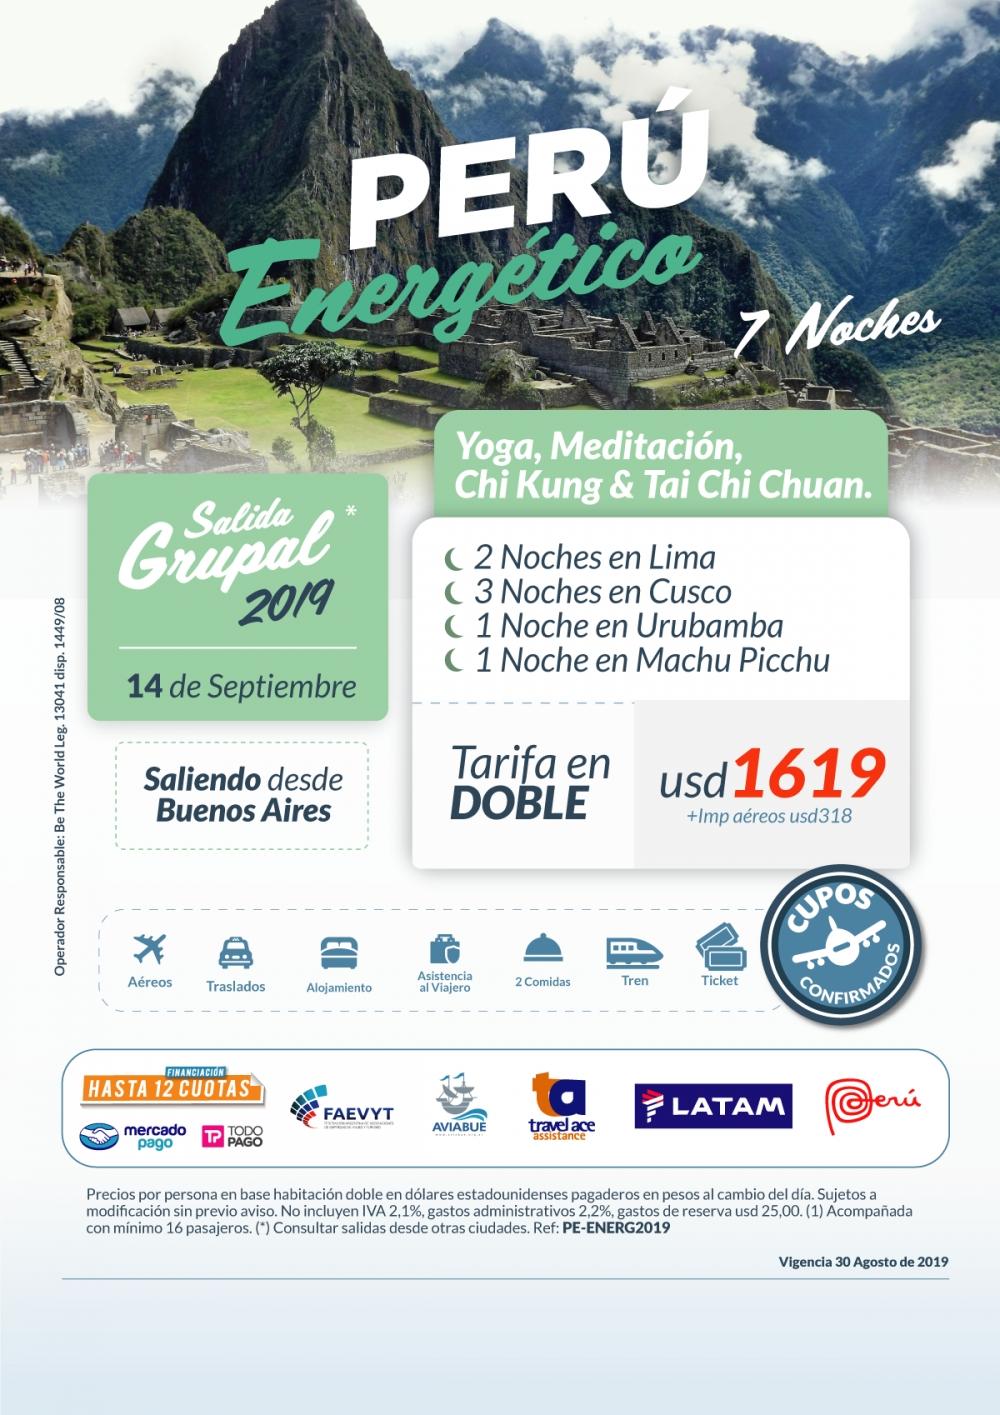 PERU ENERGÉTICO - Salida grupal  - 14 de Septiembre